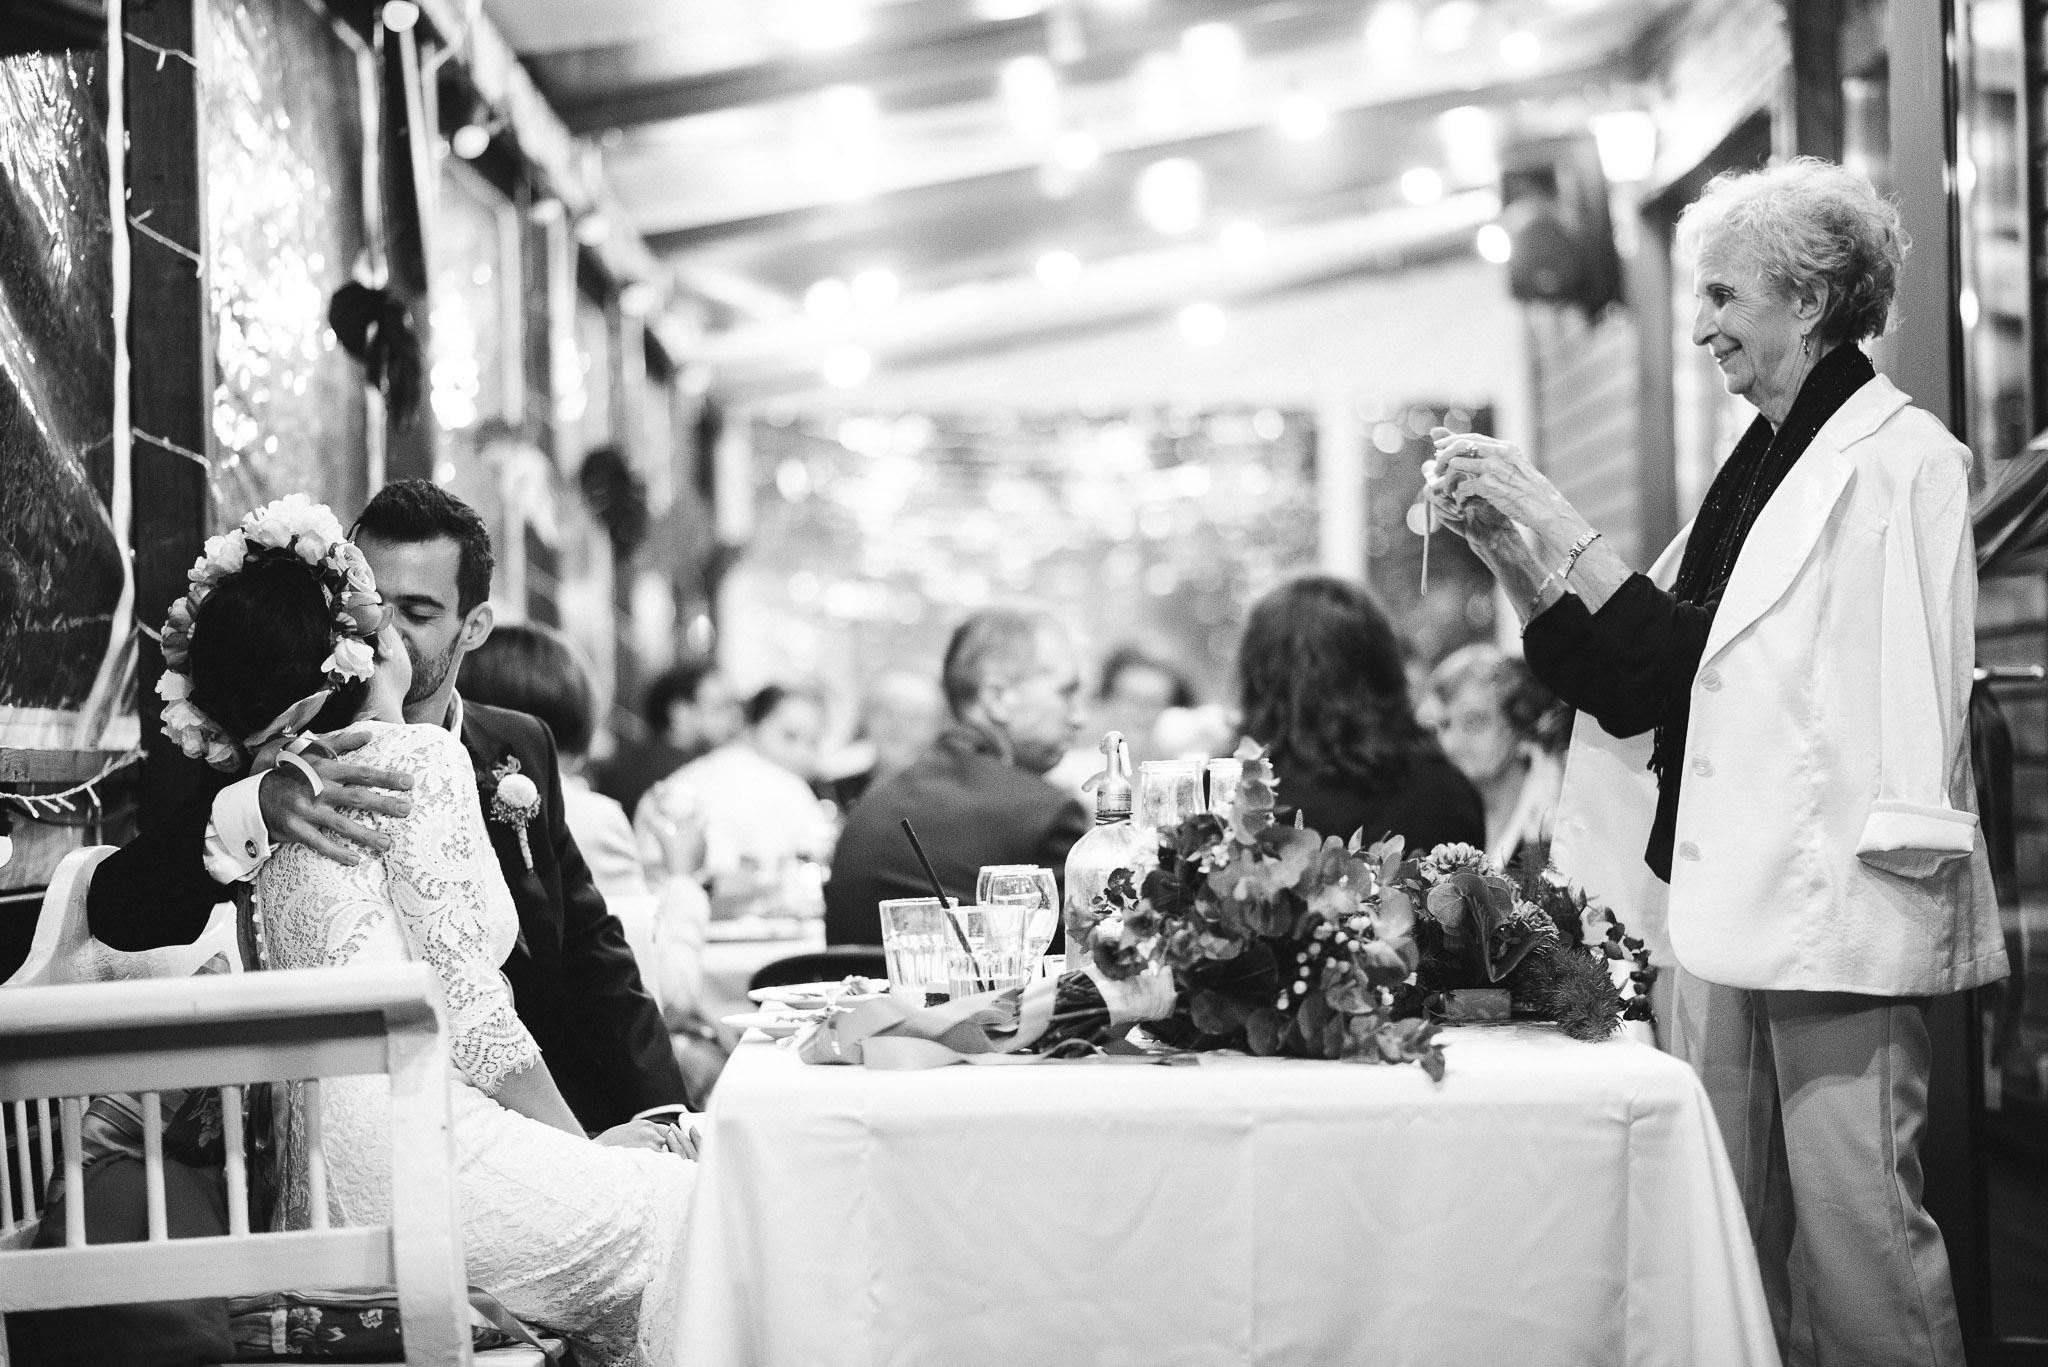 diaandgabor engagement wedding photography sweden hungary international photographer